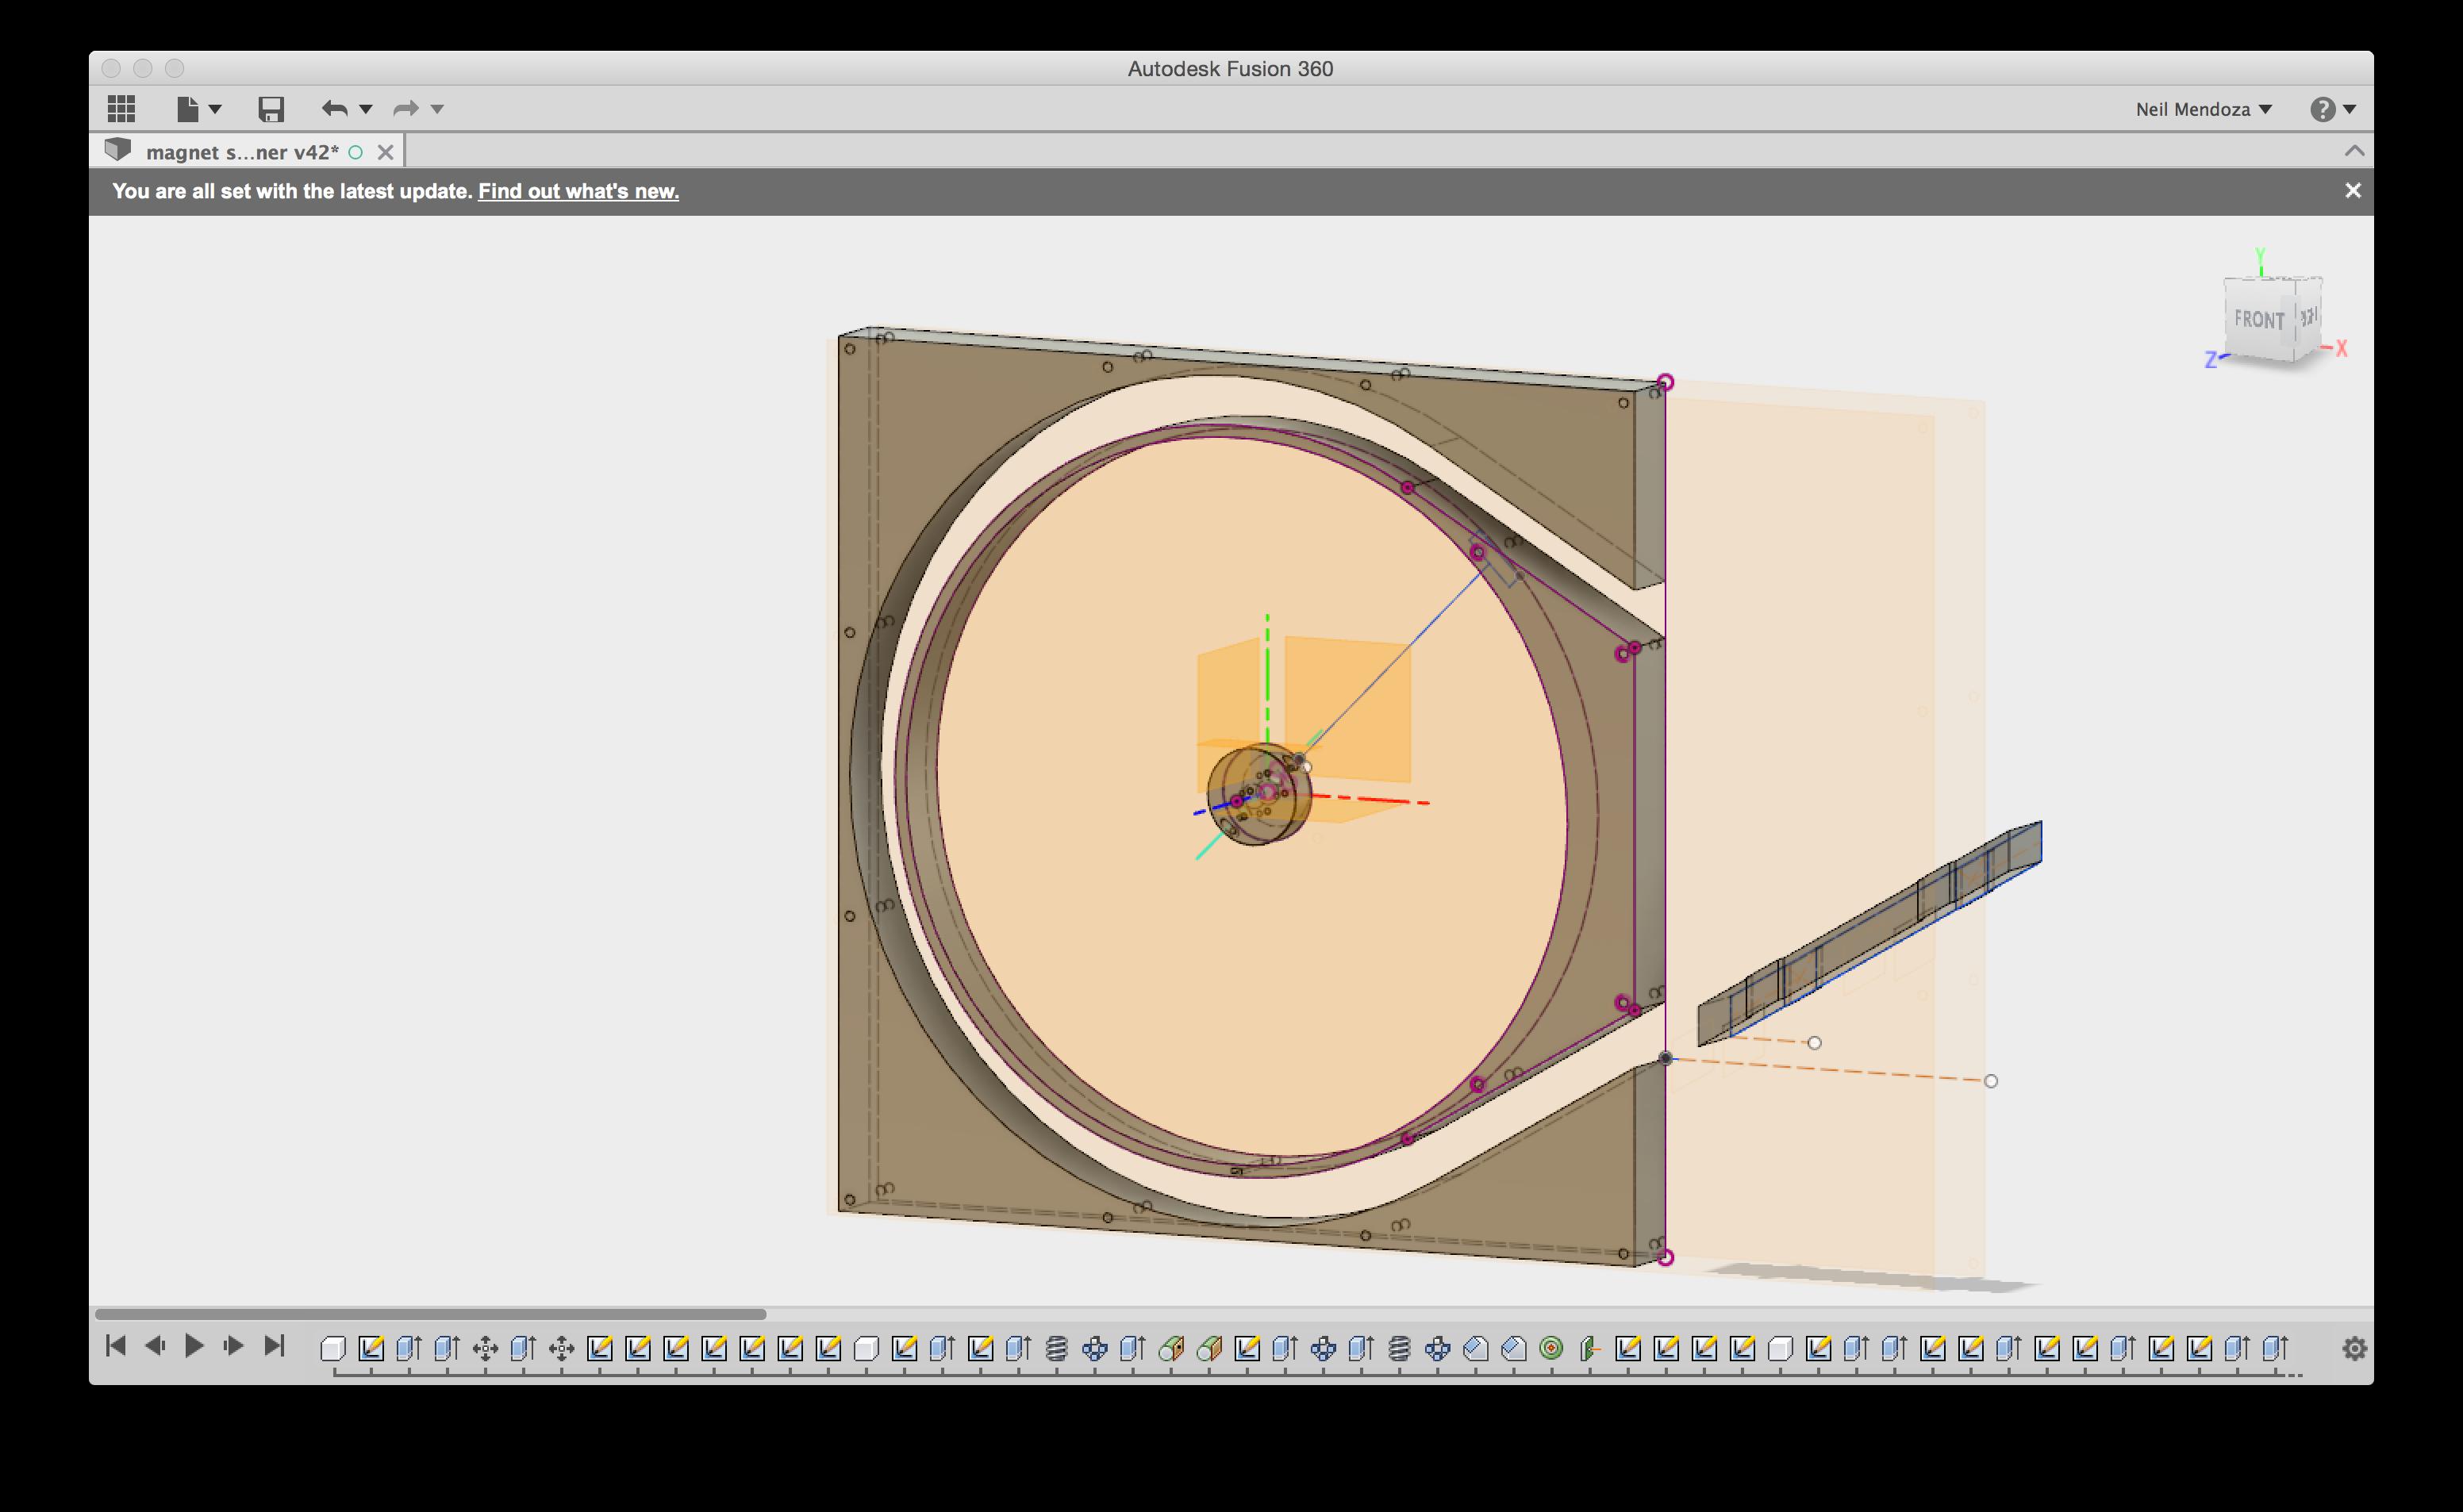 Neil Mendoza || Autodesk Fusion 360